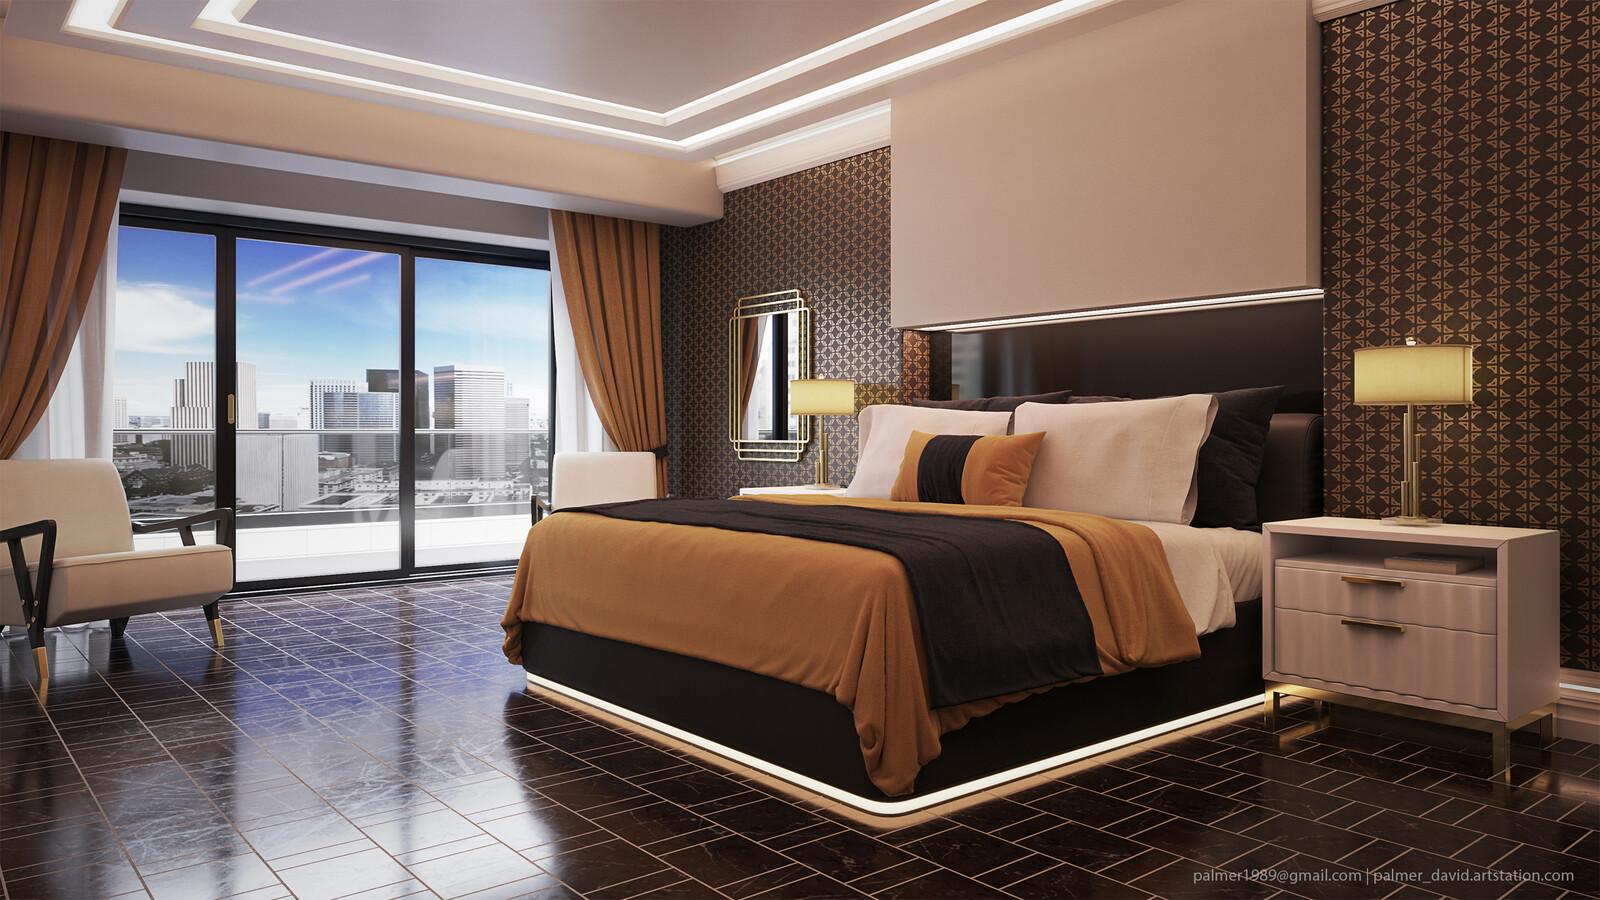 Hotel Room W/King